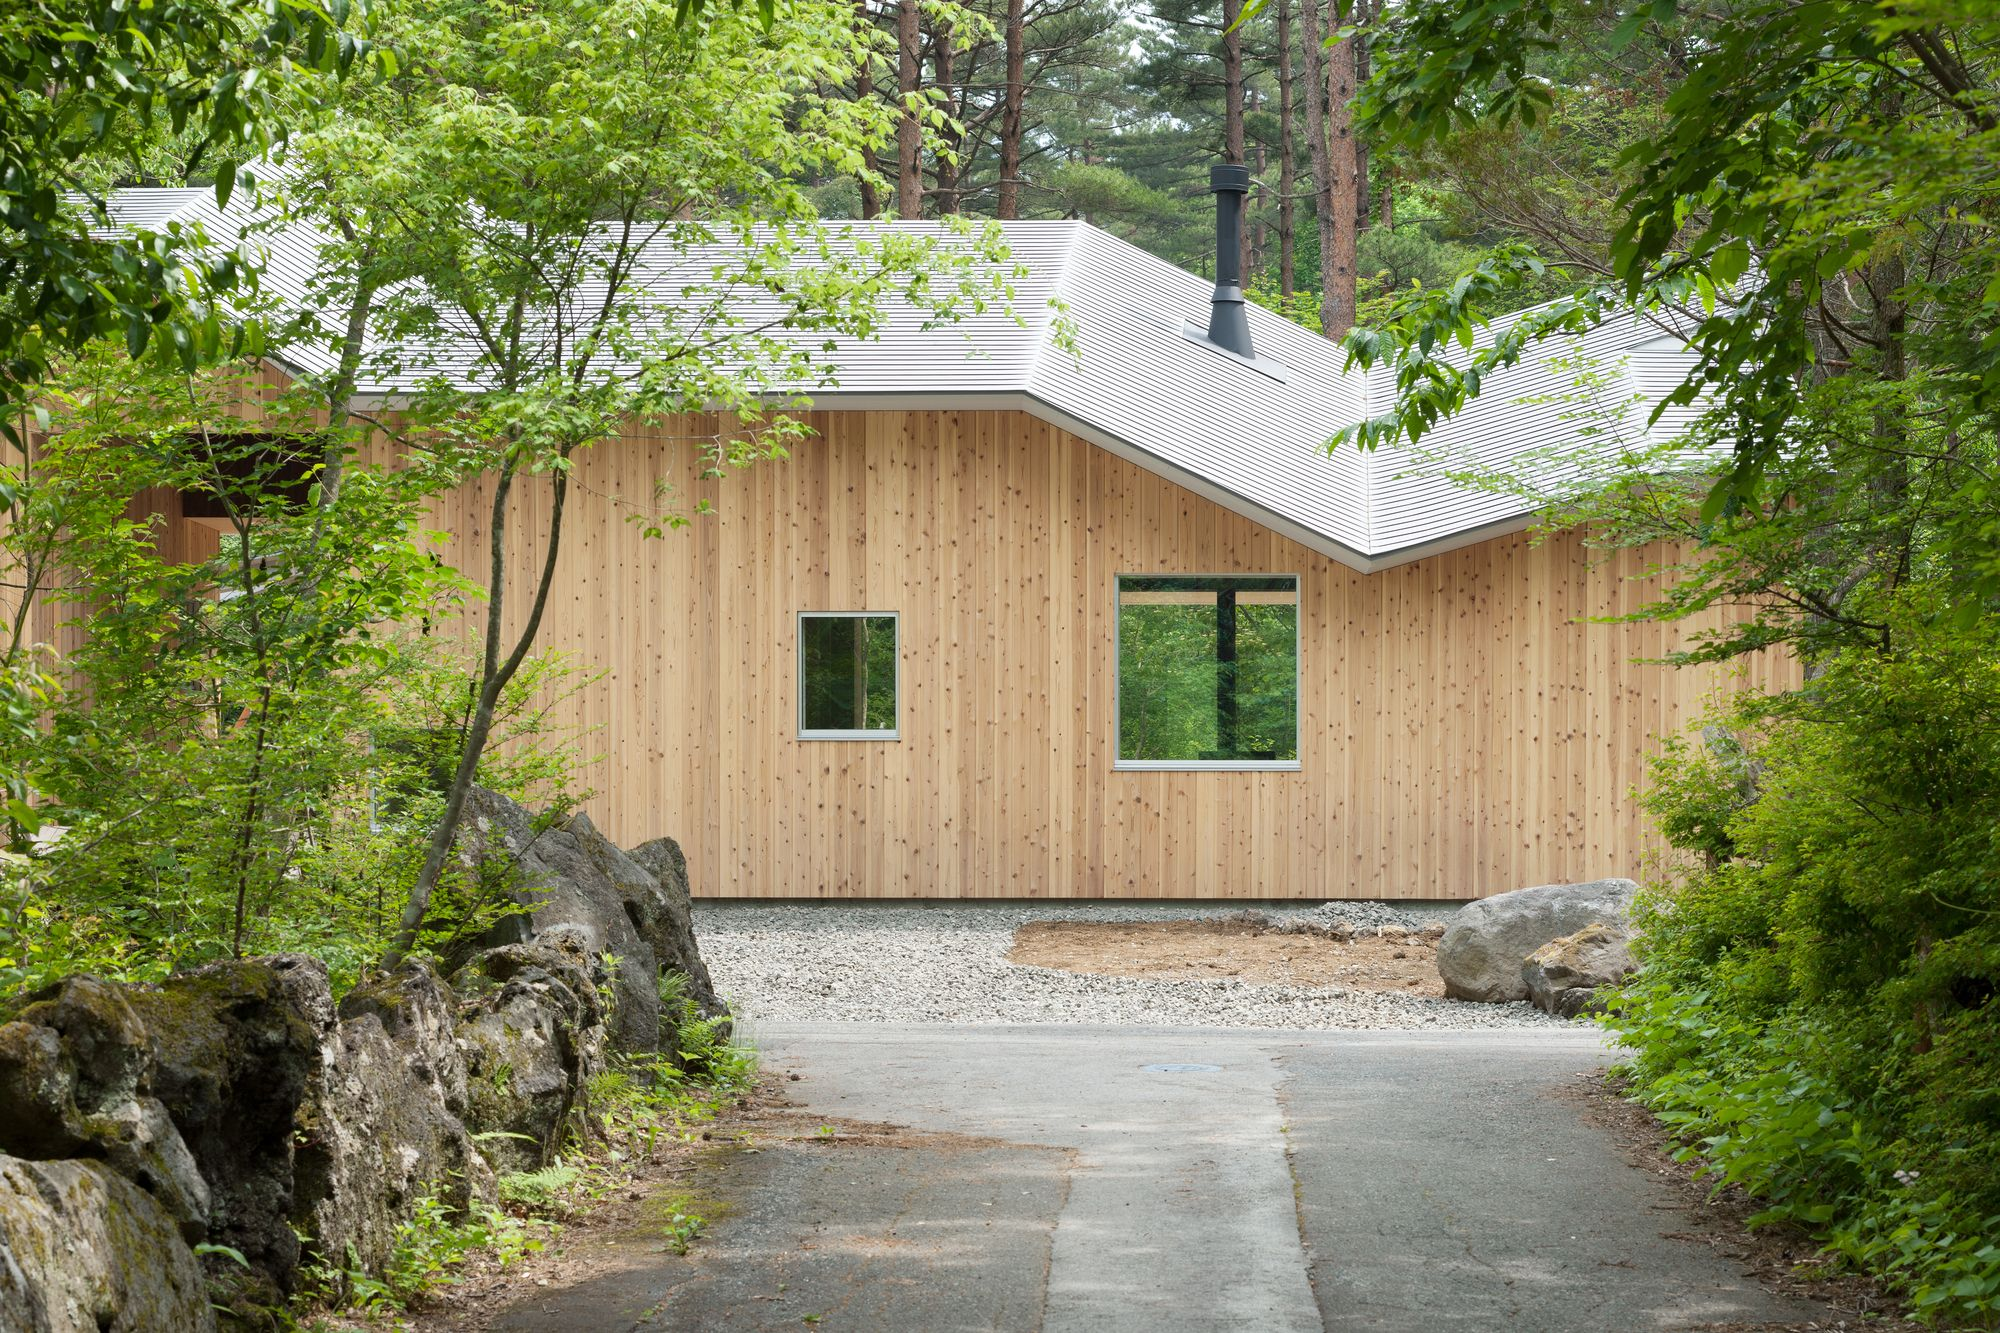 Shed Roof House Hiroki Tominaga Atelier Fuji House House Roof Architecture